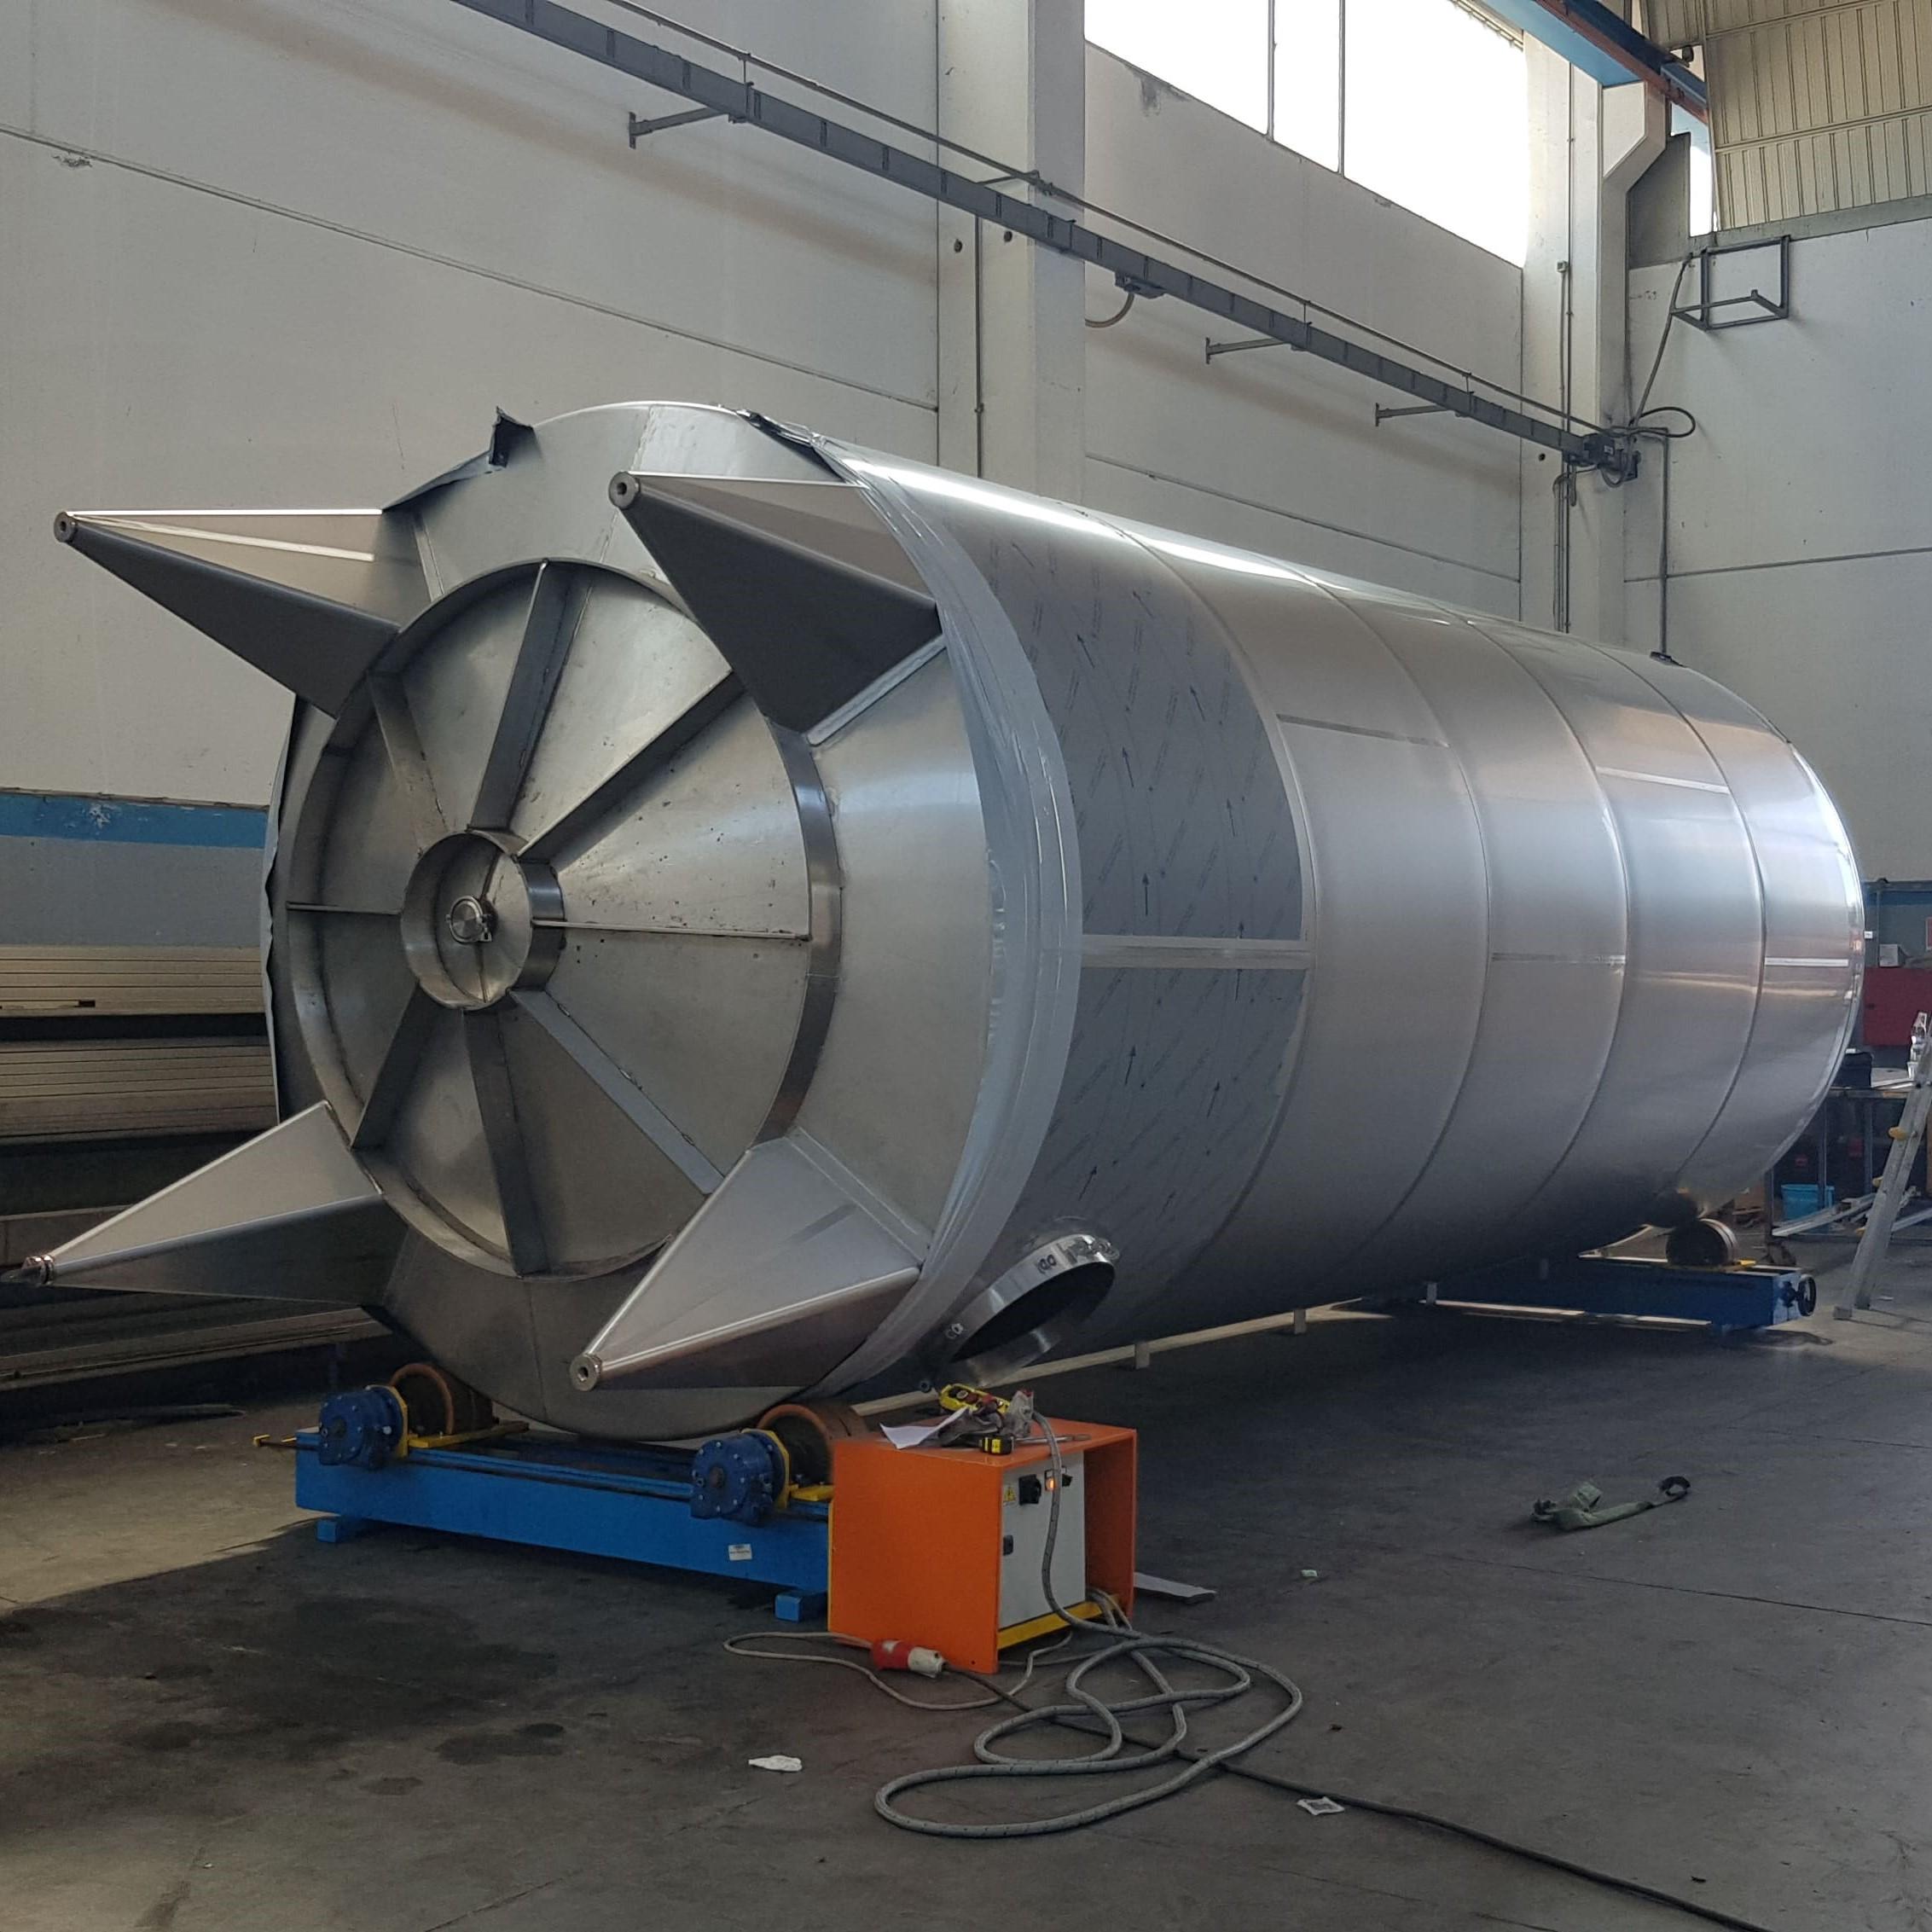 2x 50000 liter agitator tanks for glue (export to USA)